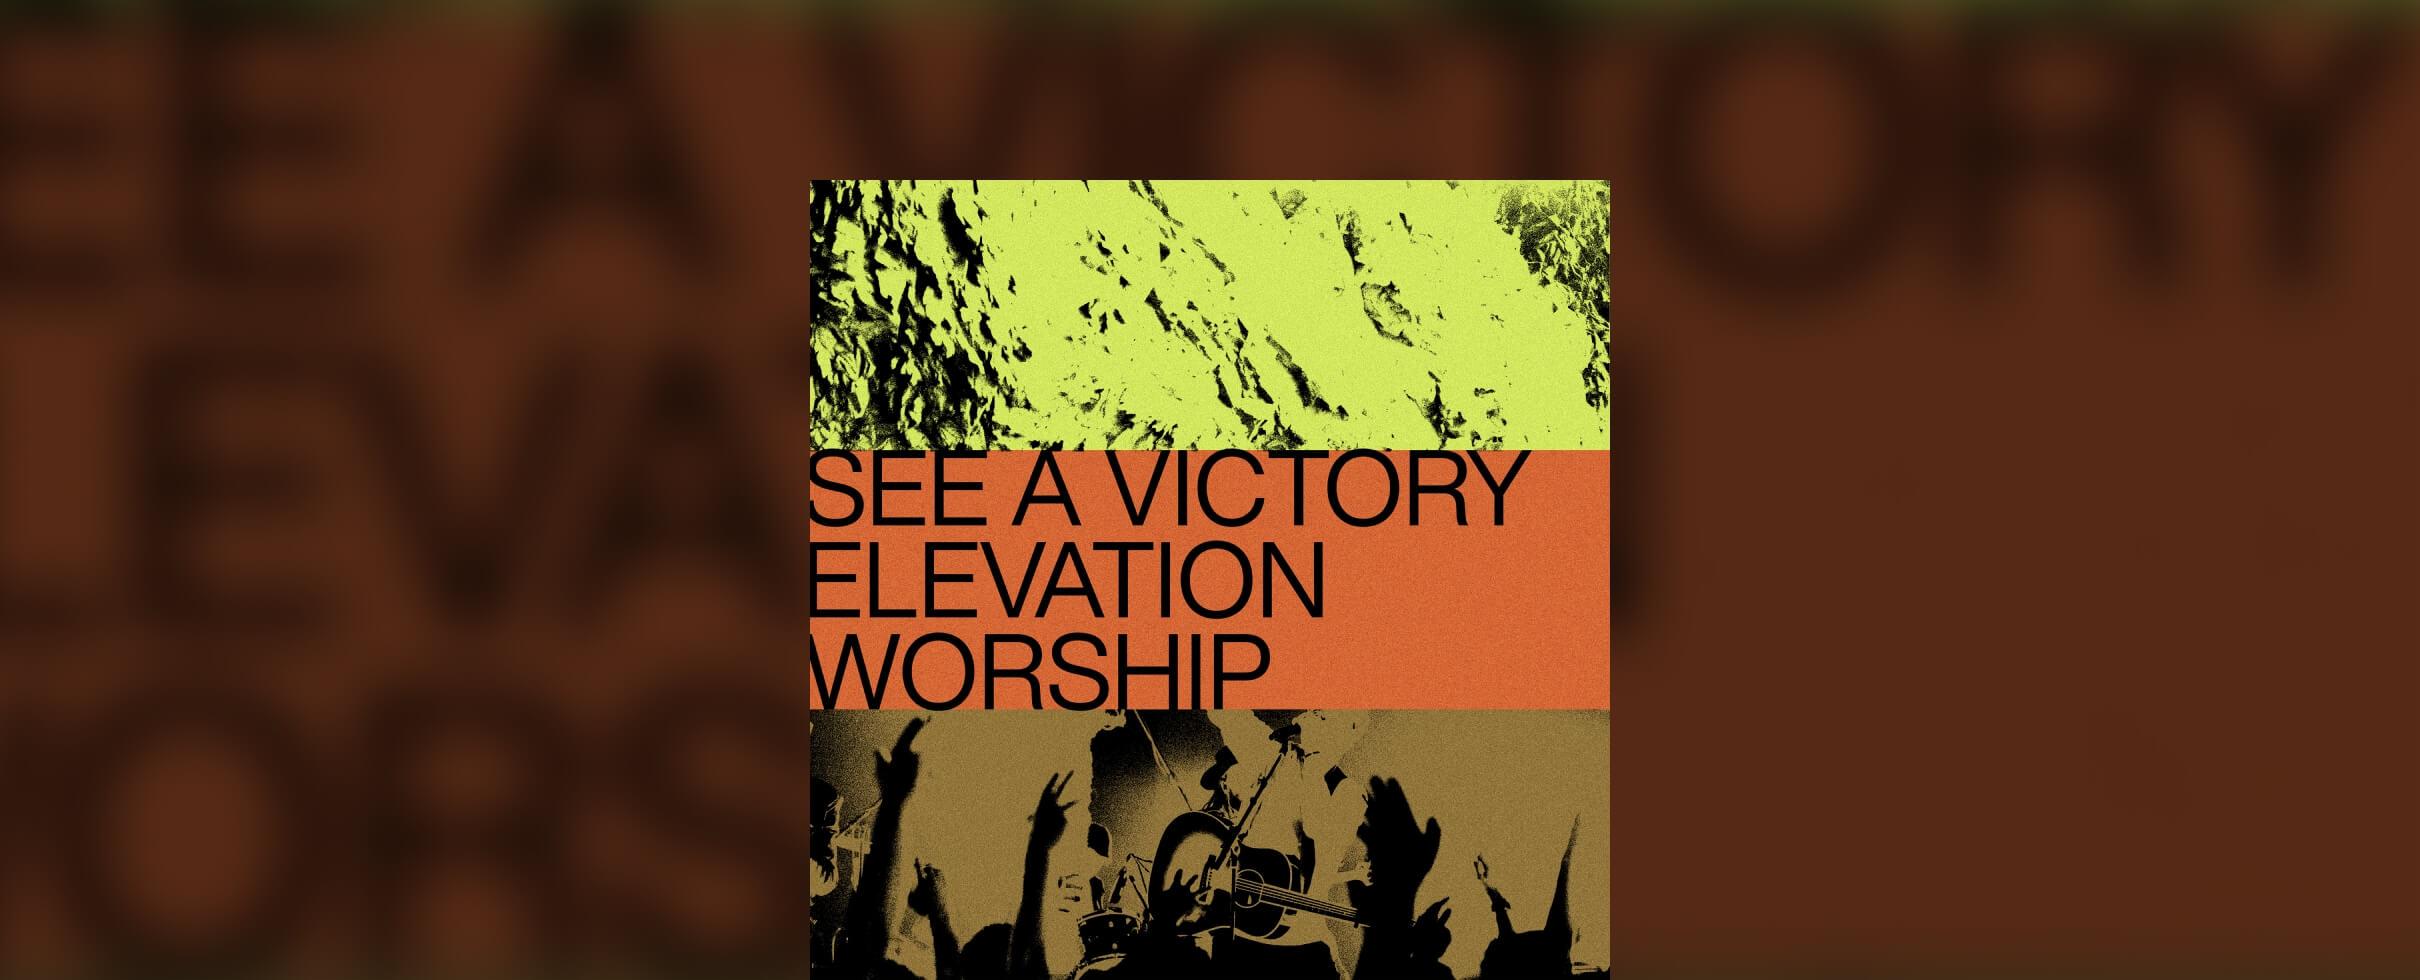 Digital Resources for Worship Teams | MultiTracks